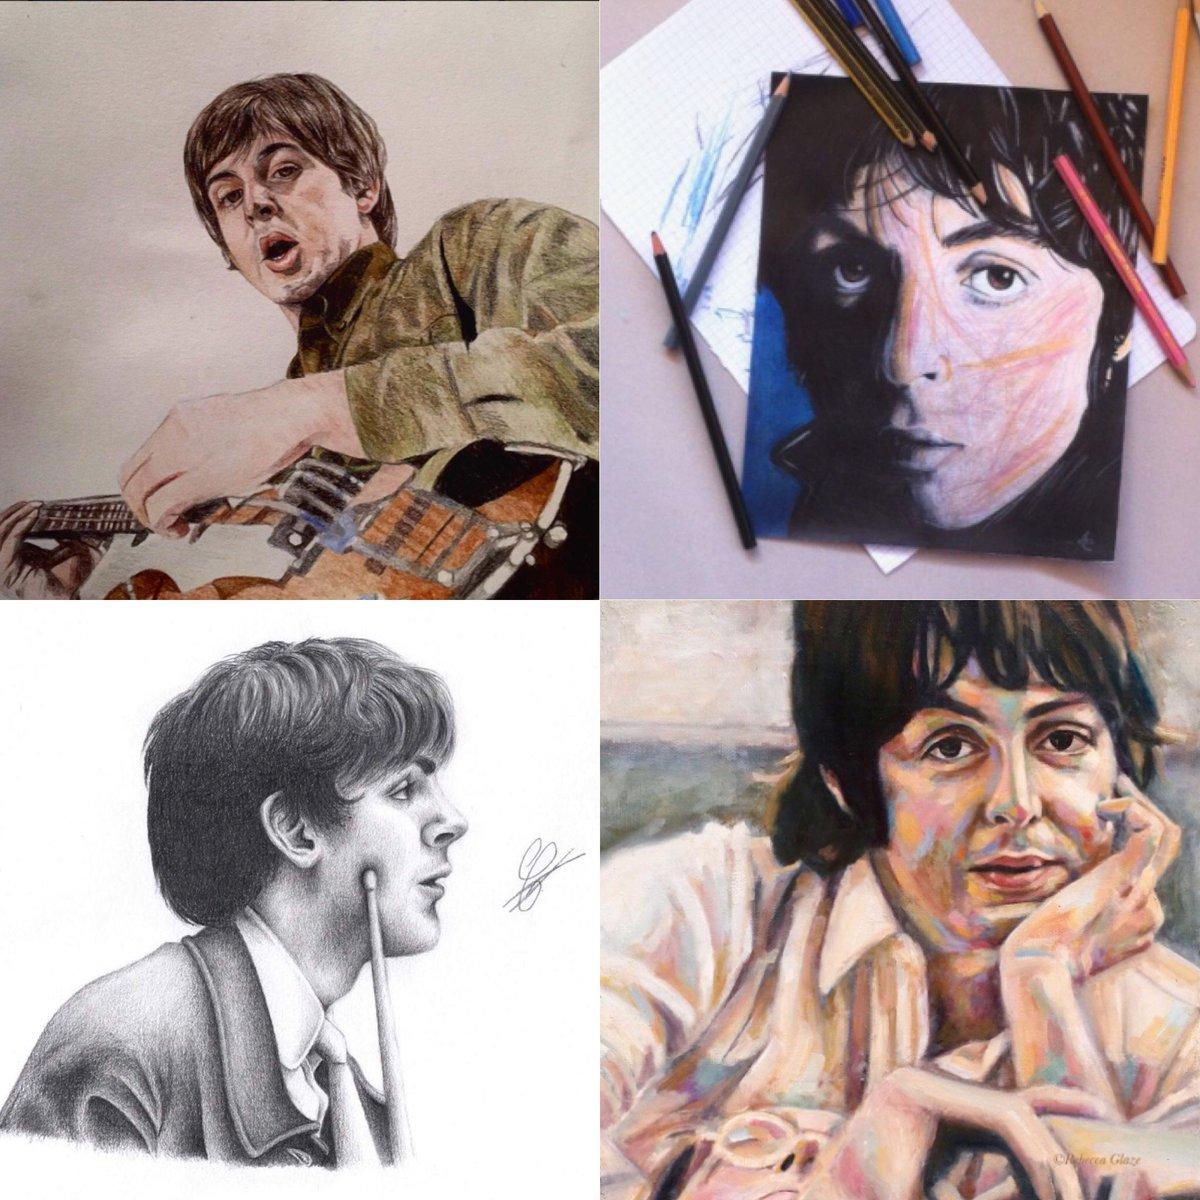 Paul McCartney On Twitter FanArtFriday By MoweKro And Instagram Users Annelouvel Elyalbertini Rebeccaglazeartist Share Your FanArt With